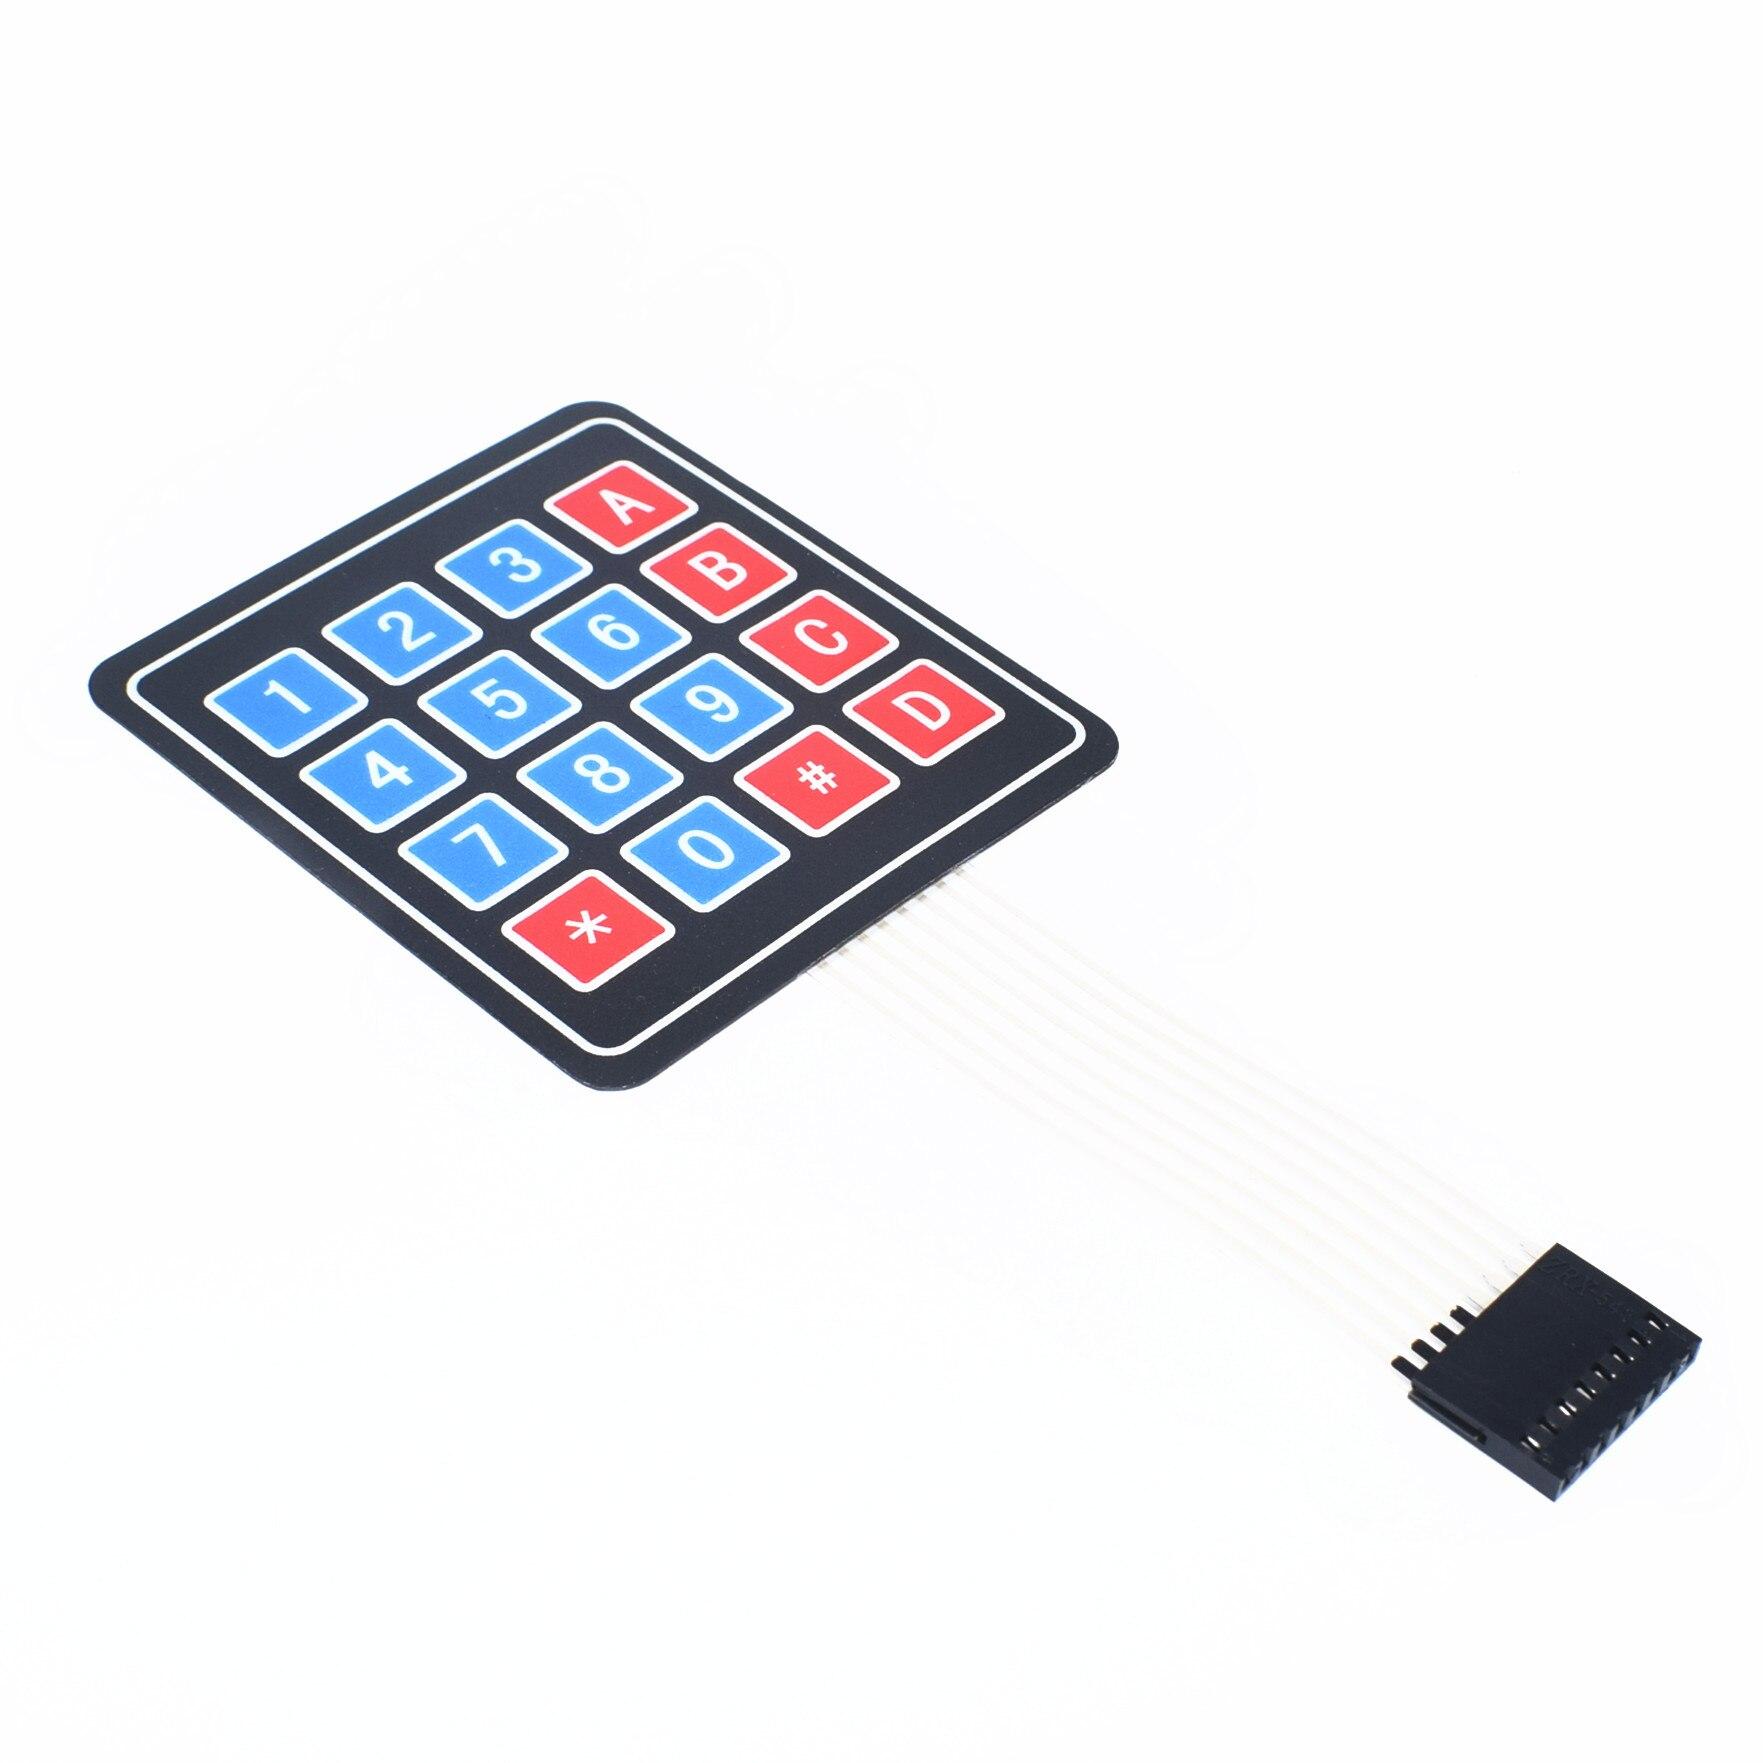 1 Stks/partij 4*4 Matrix Array/Matrix Keyboard 16 Key Membraan Switch Toetsenbord 4X4 Matrix Toetsenbord h75